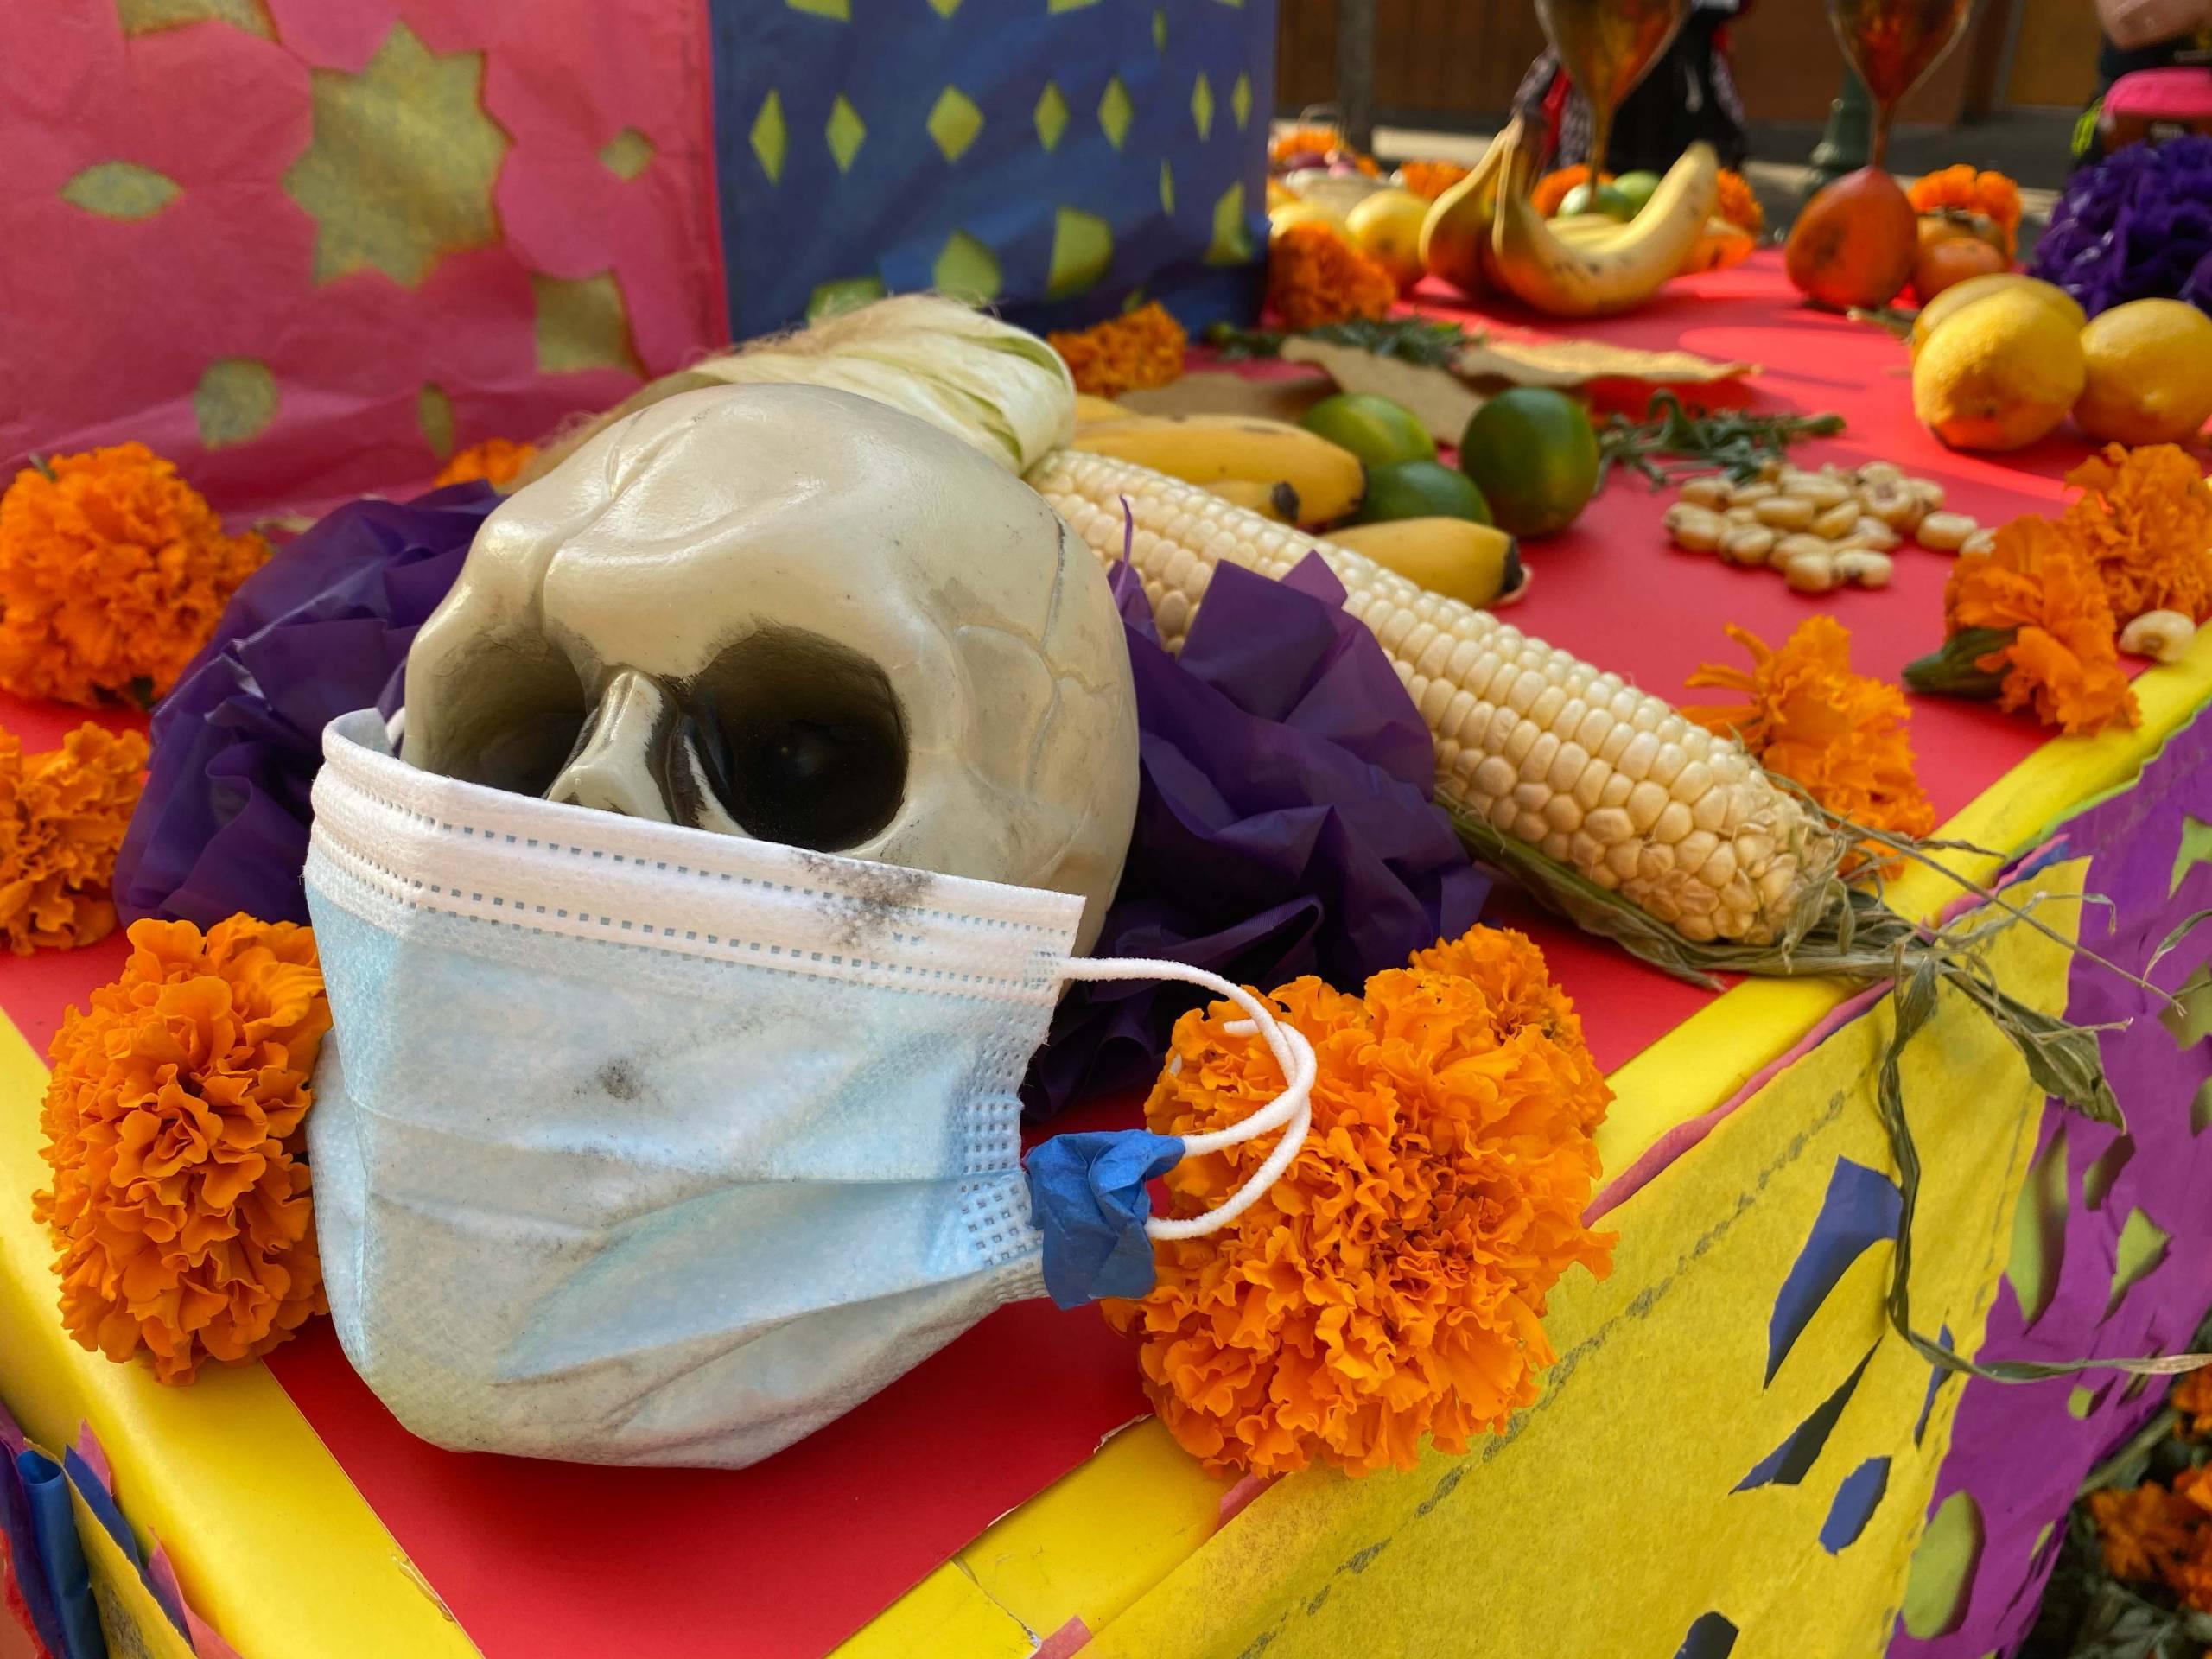 A Día de los Muertos family altar display featuring a skull wearing a face mask.